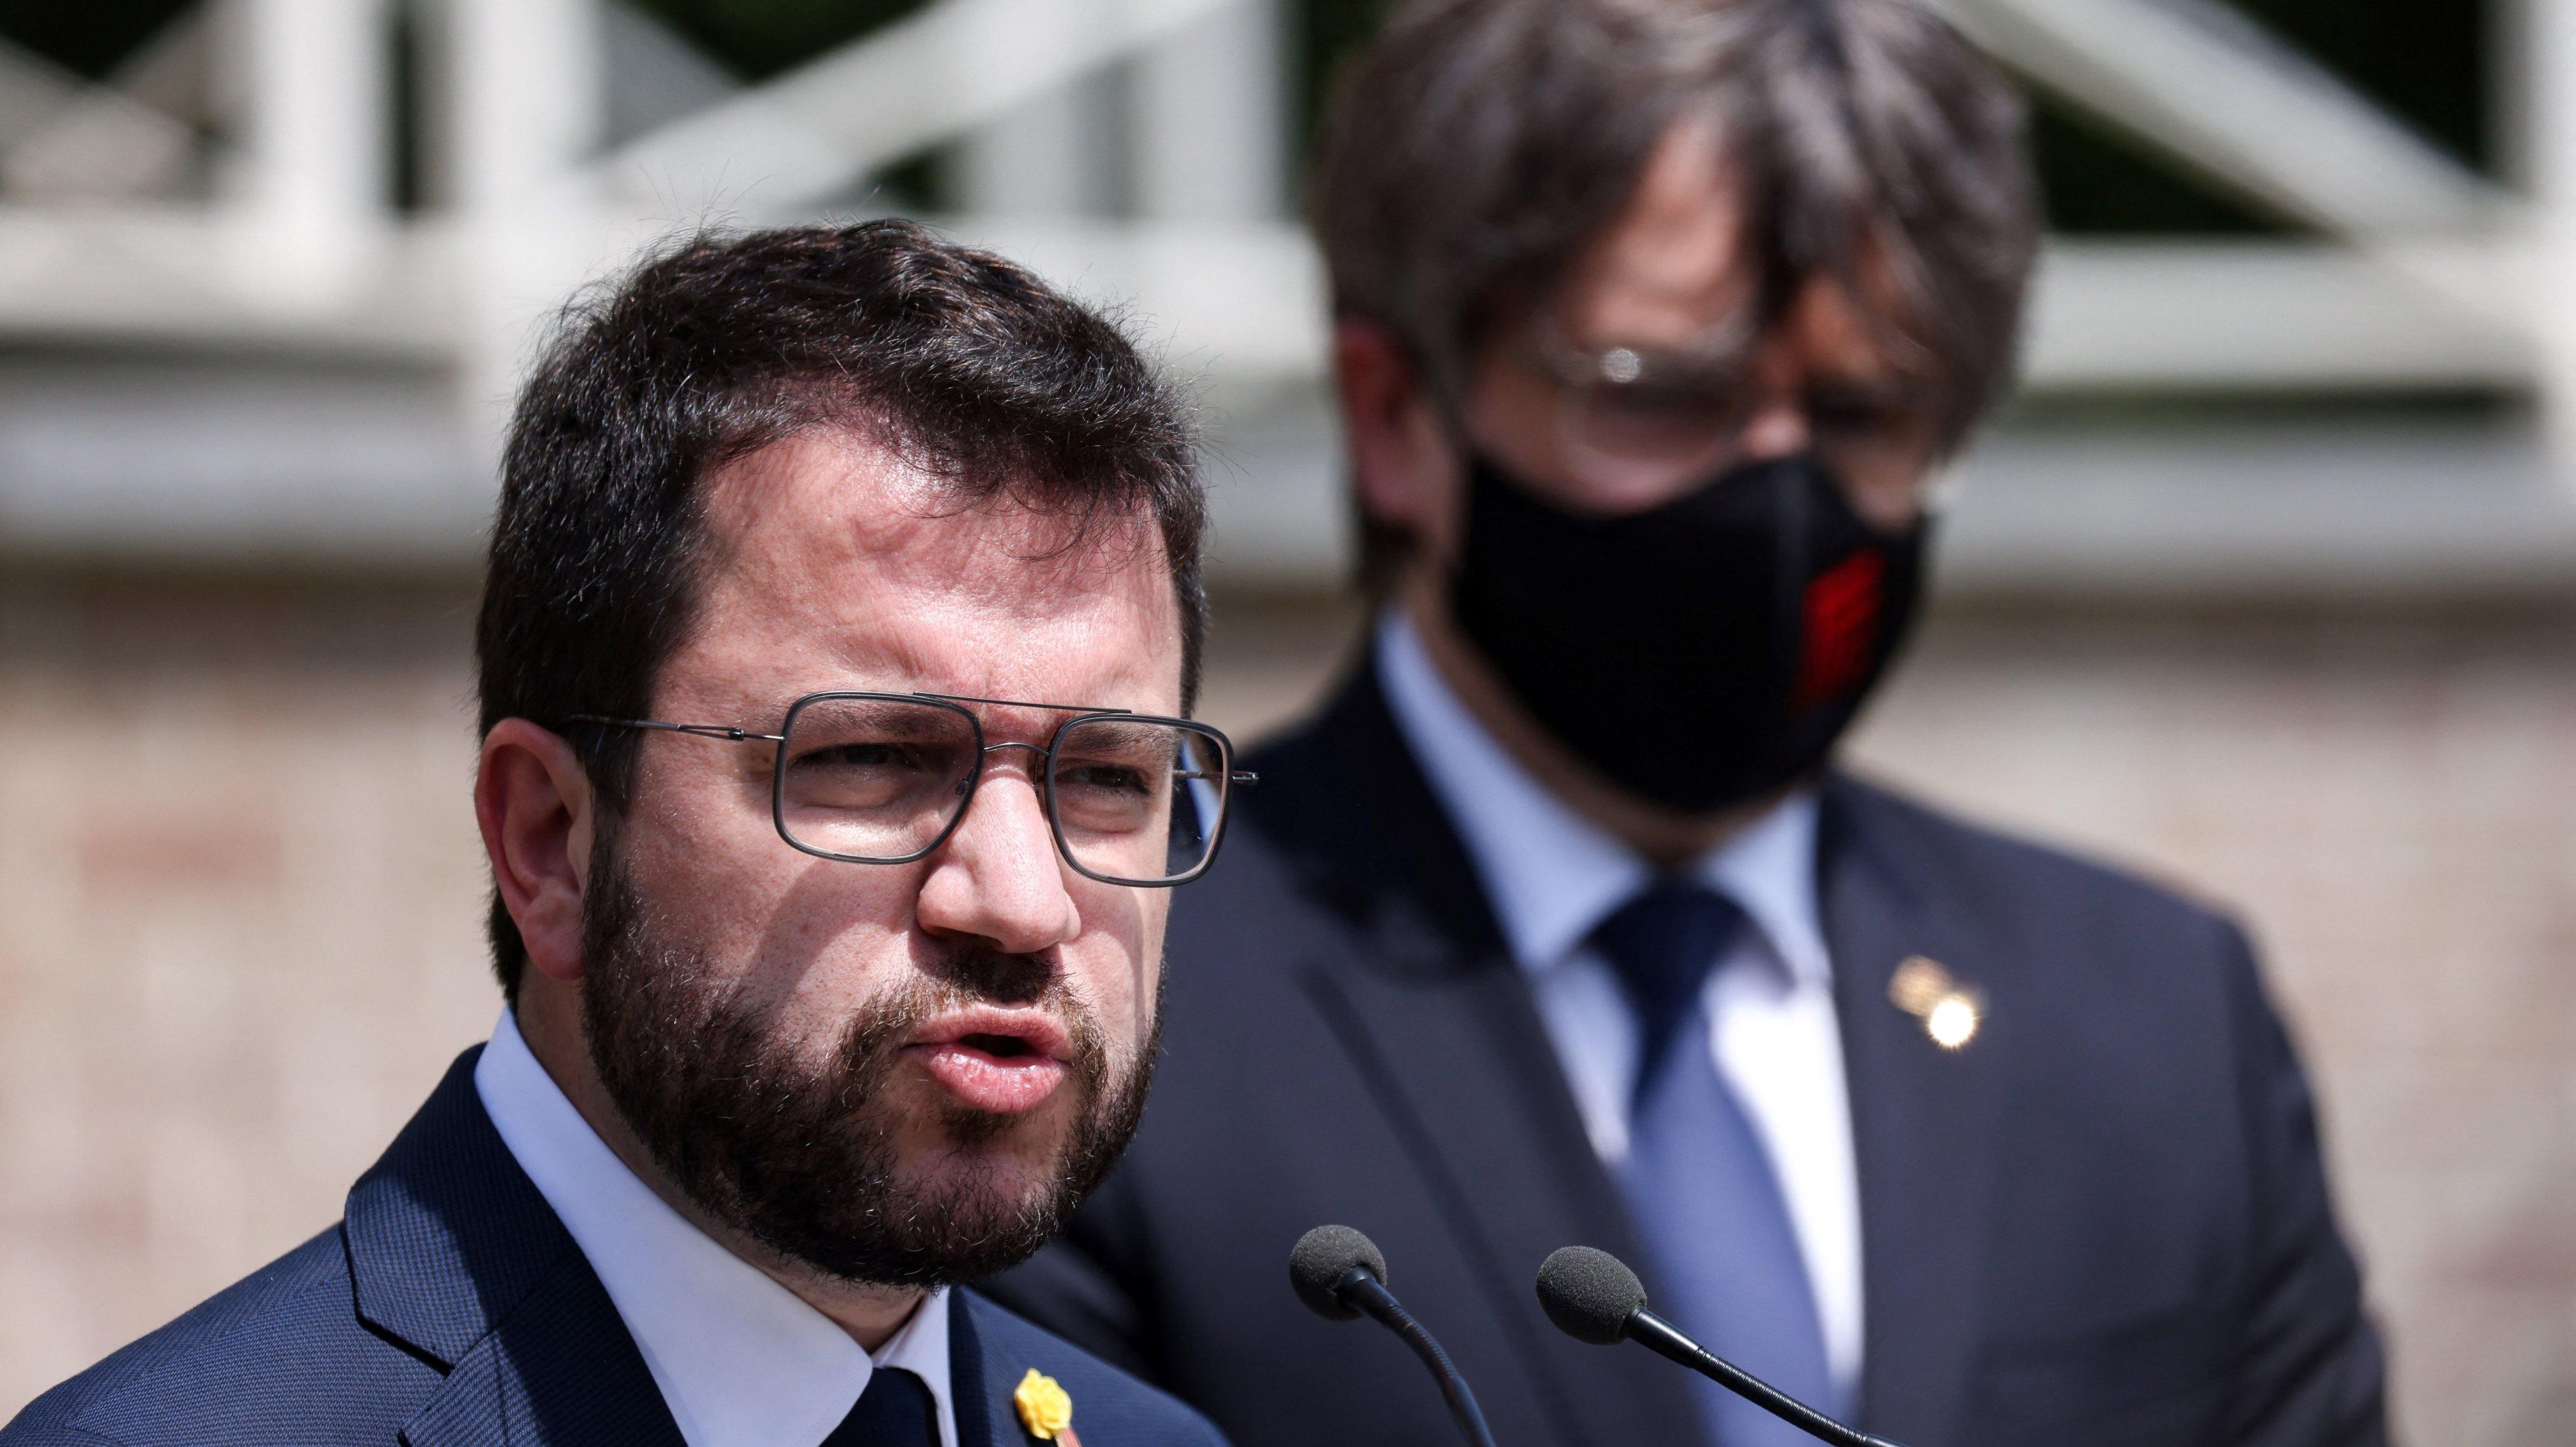 BELGIUM-EU-SPAIN-CATALONIA-POLOTICS